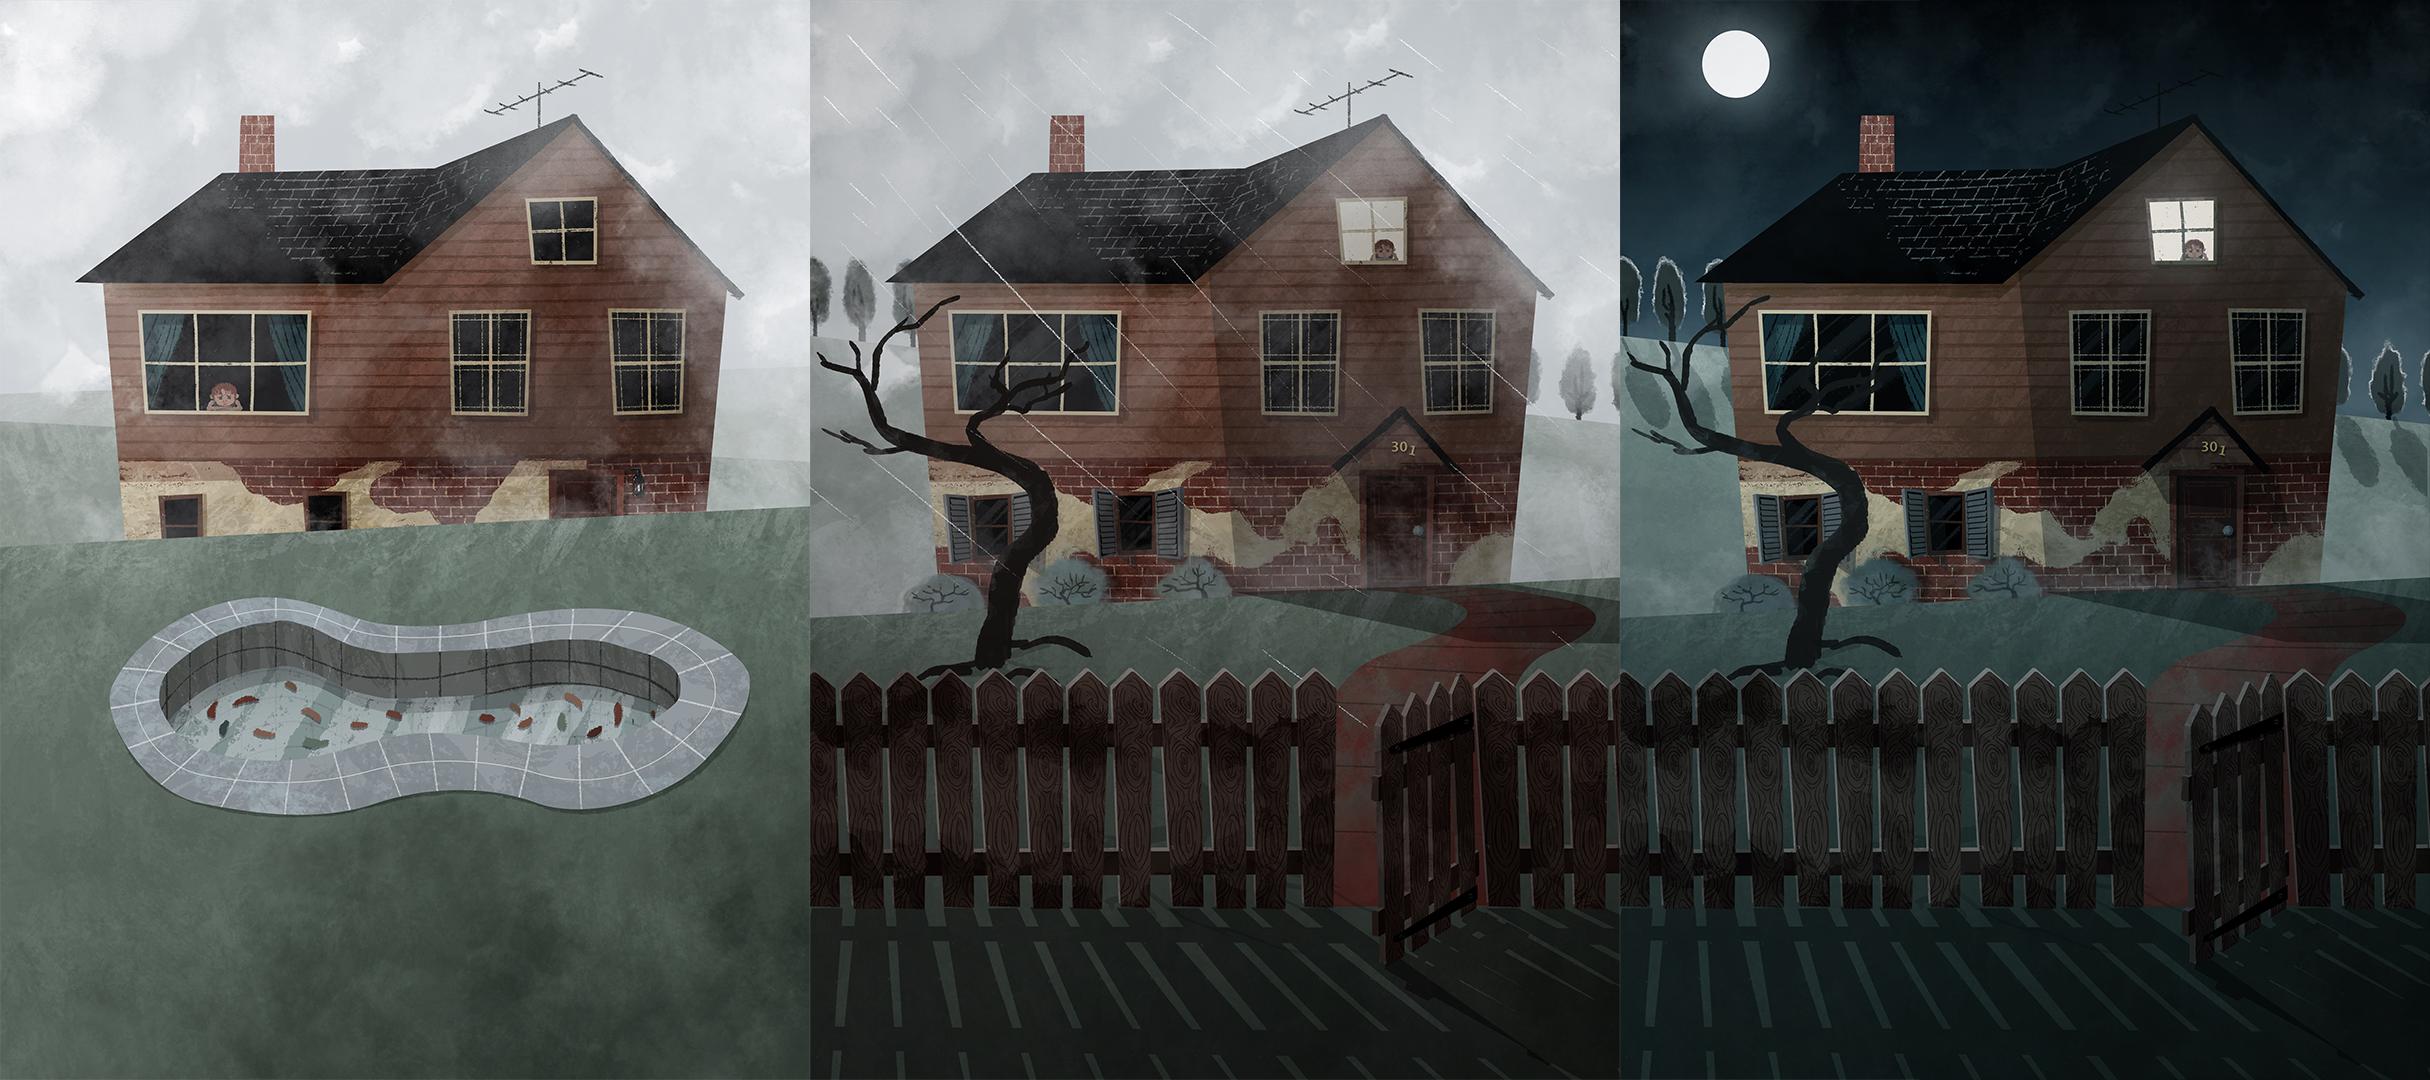 House_Concept_Art_01